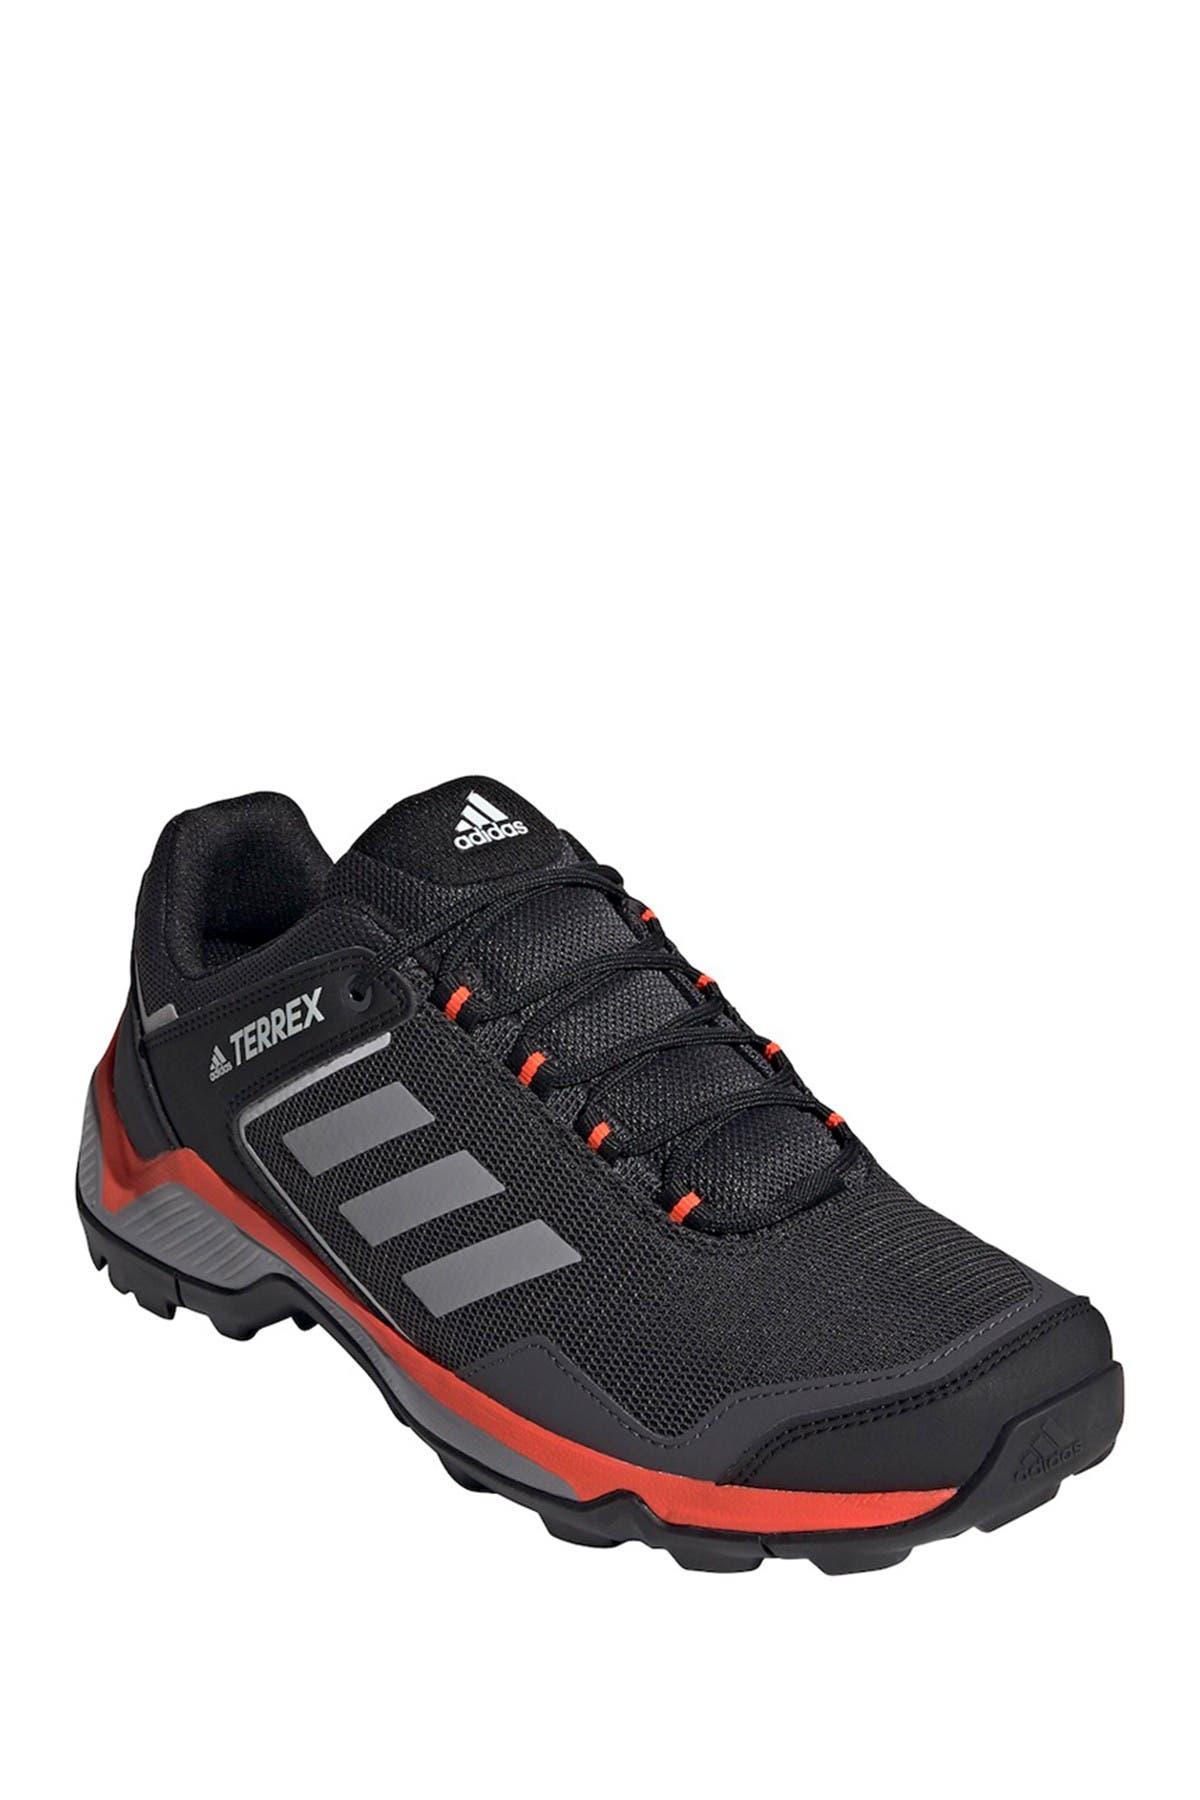 Image of adidas Terrex Eastrail GTX Hiking Shoe